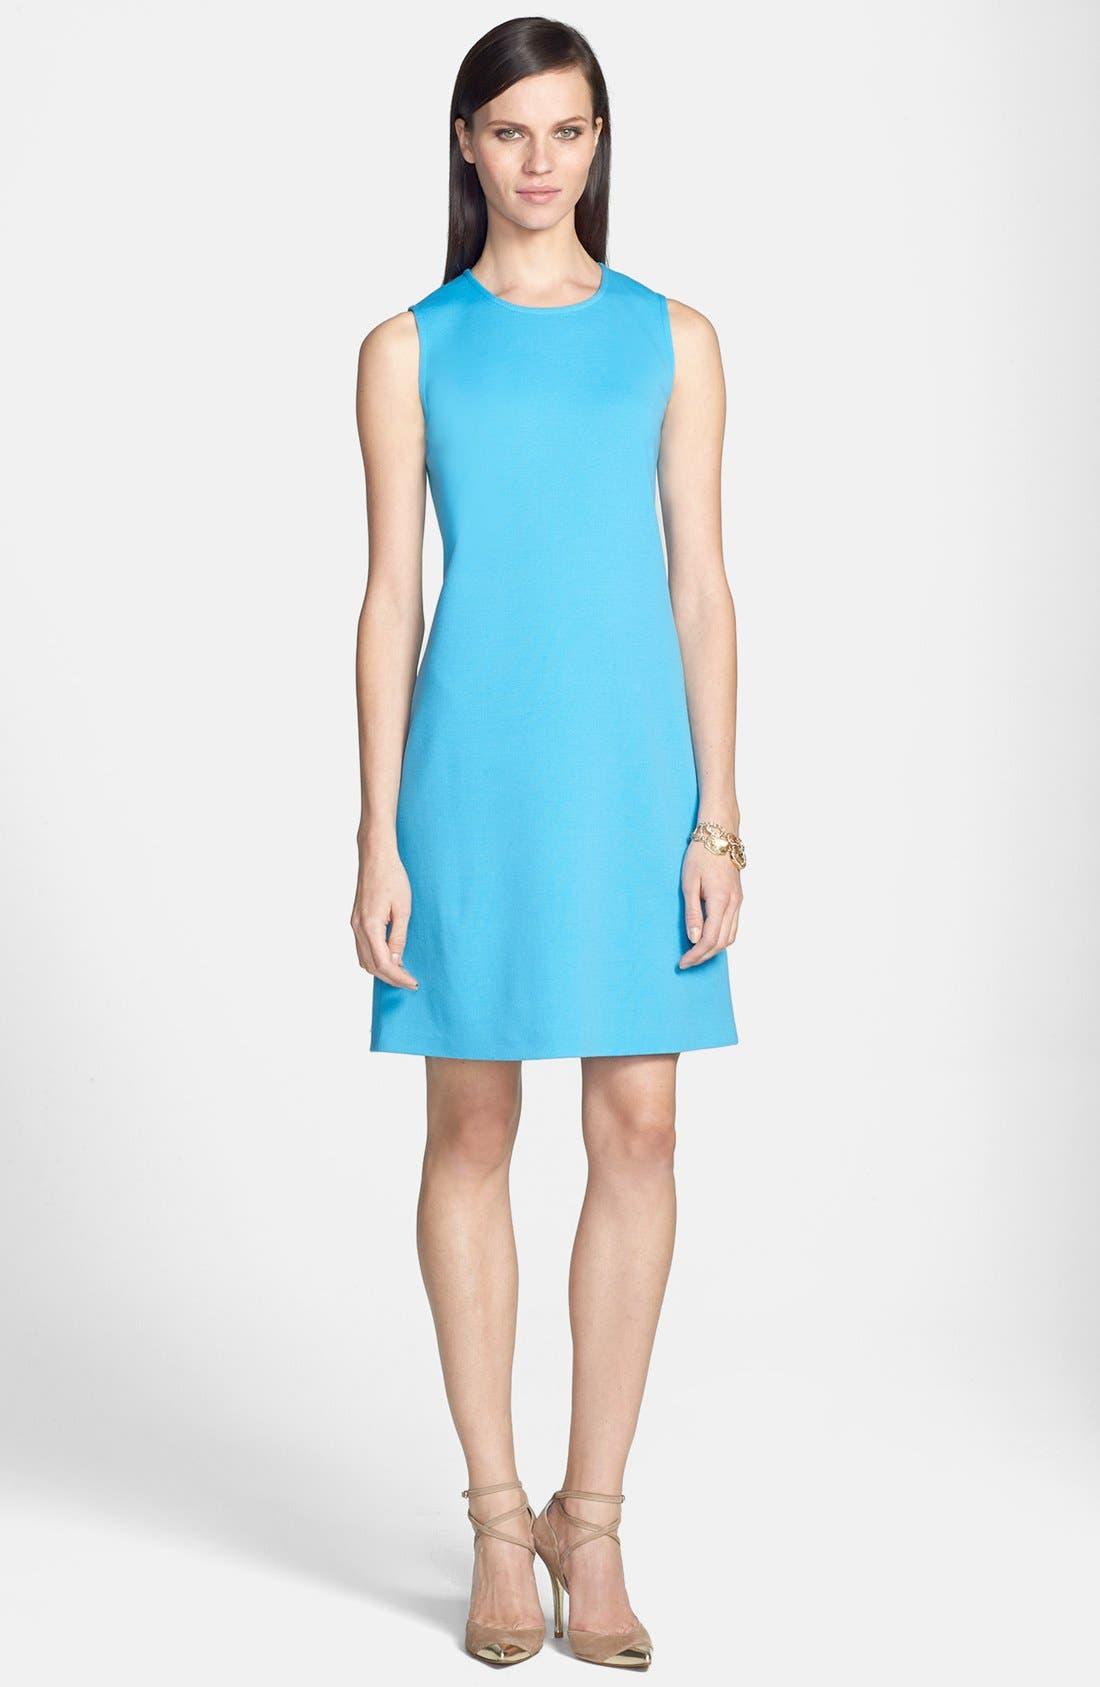 Alternate Image 1 Selected - St. John Collection Milano Knit Jewel Neck Trapeze Dress